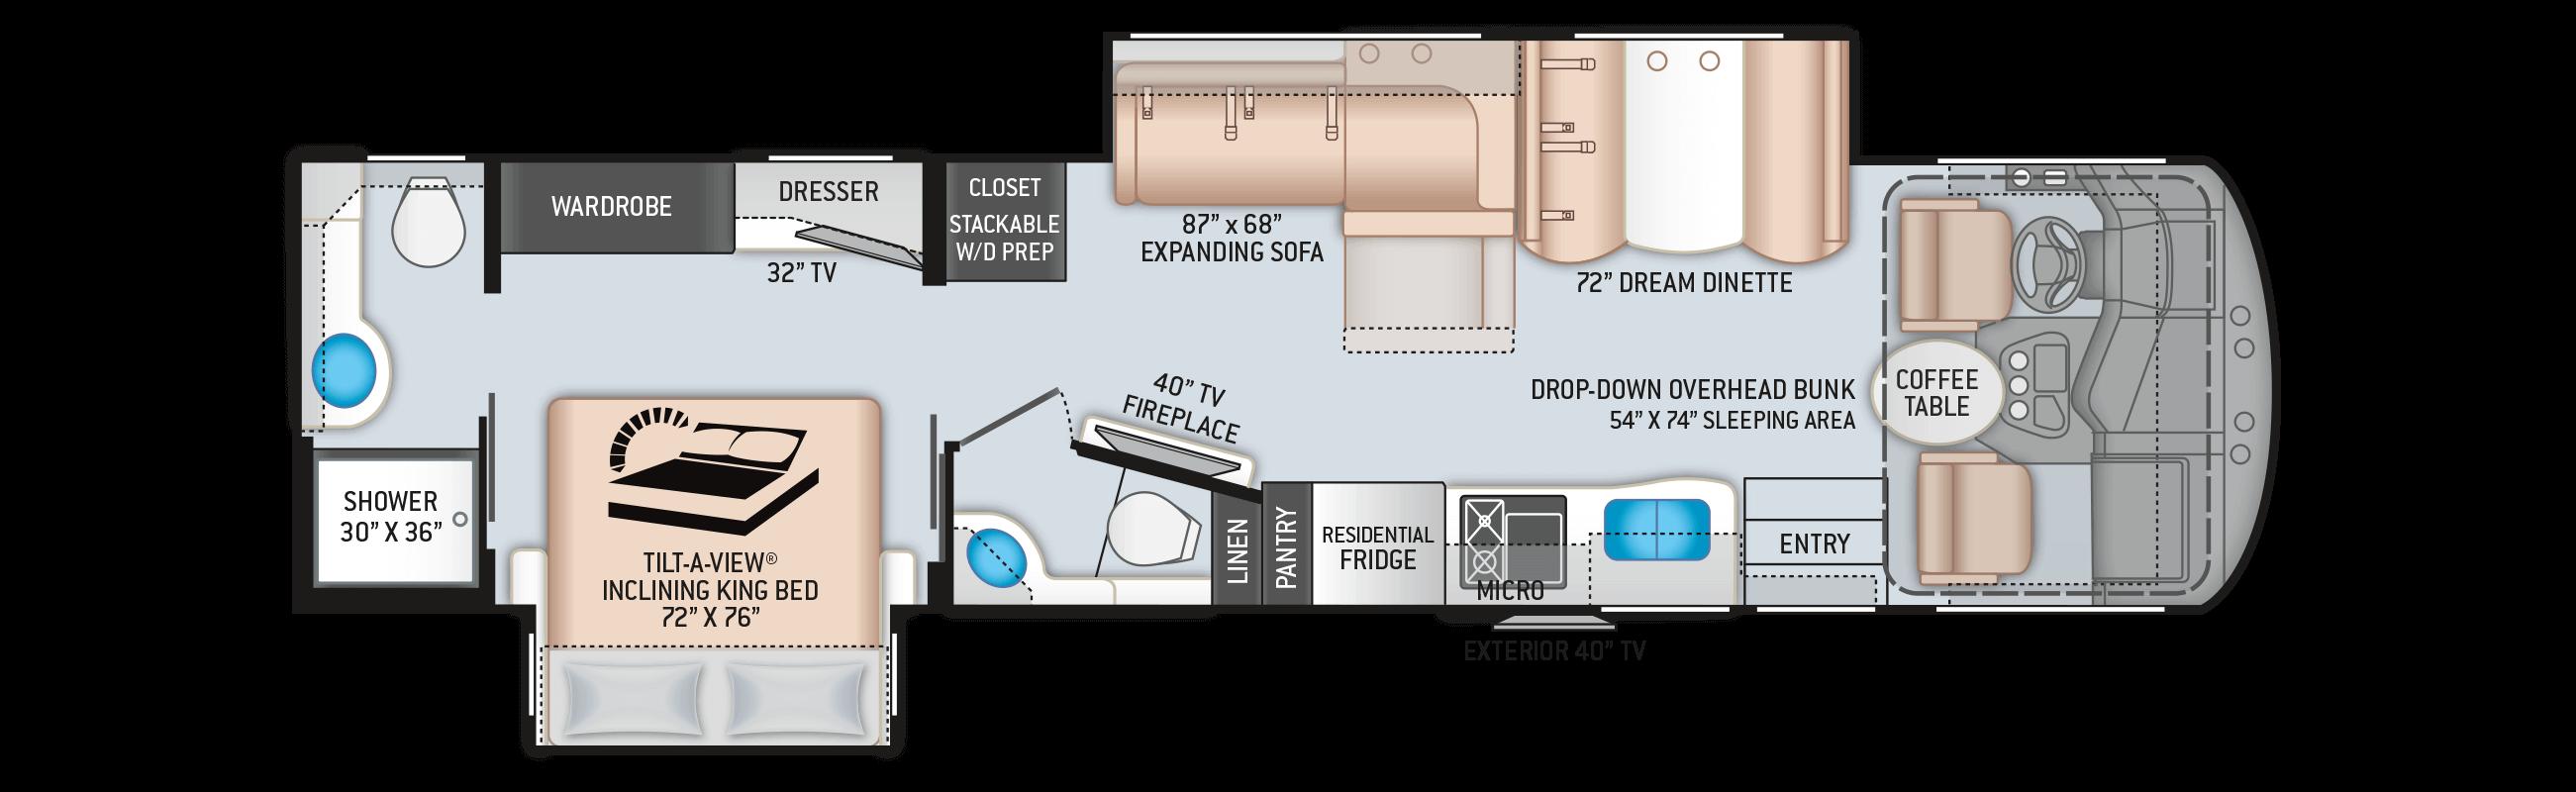 Miramar 35.3 Floor Plan